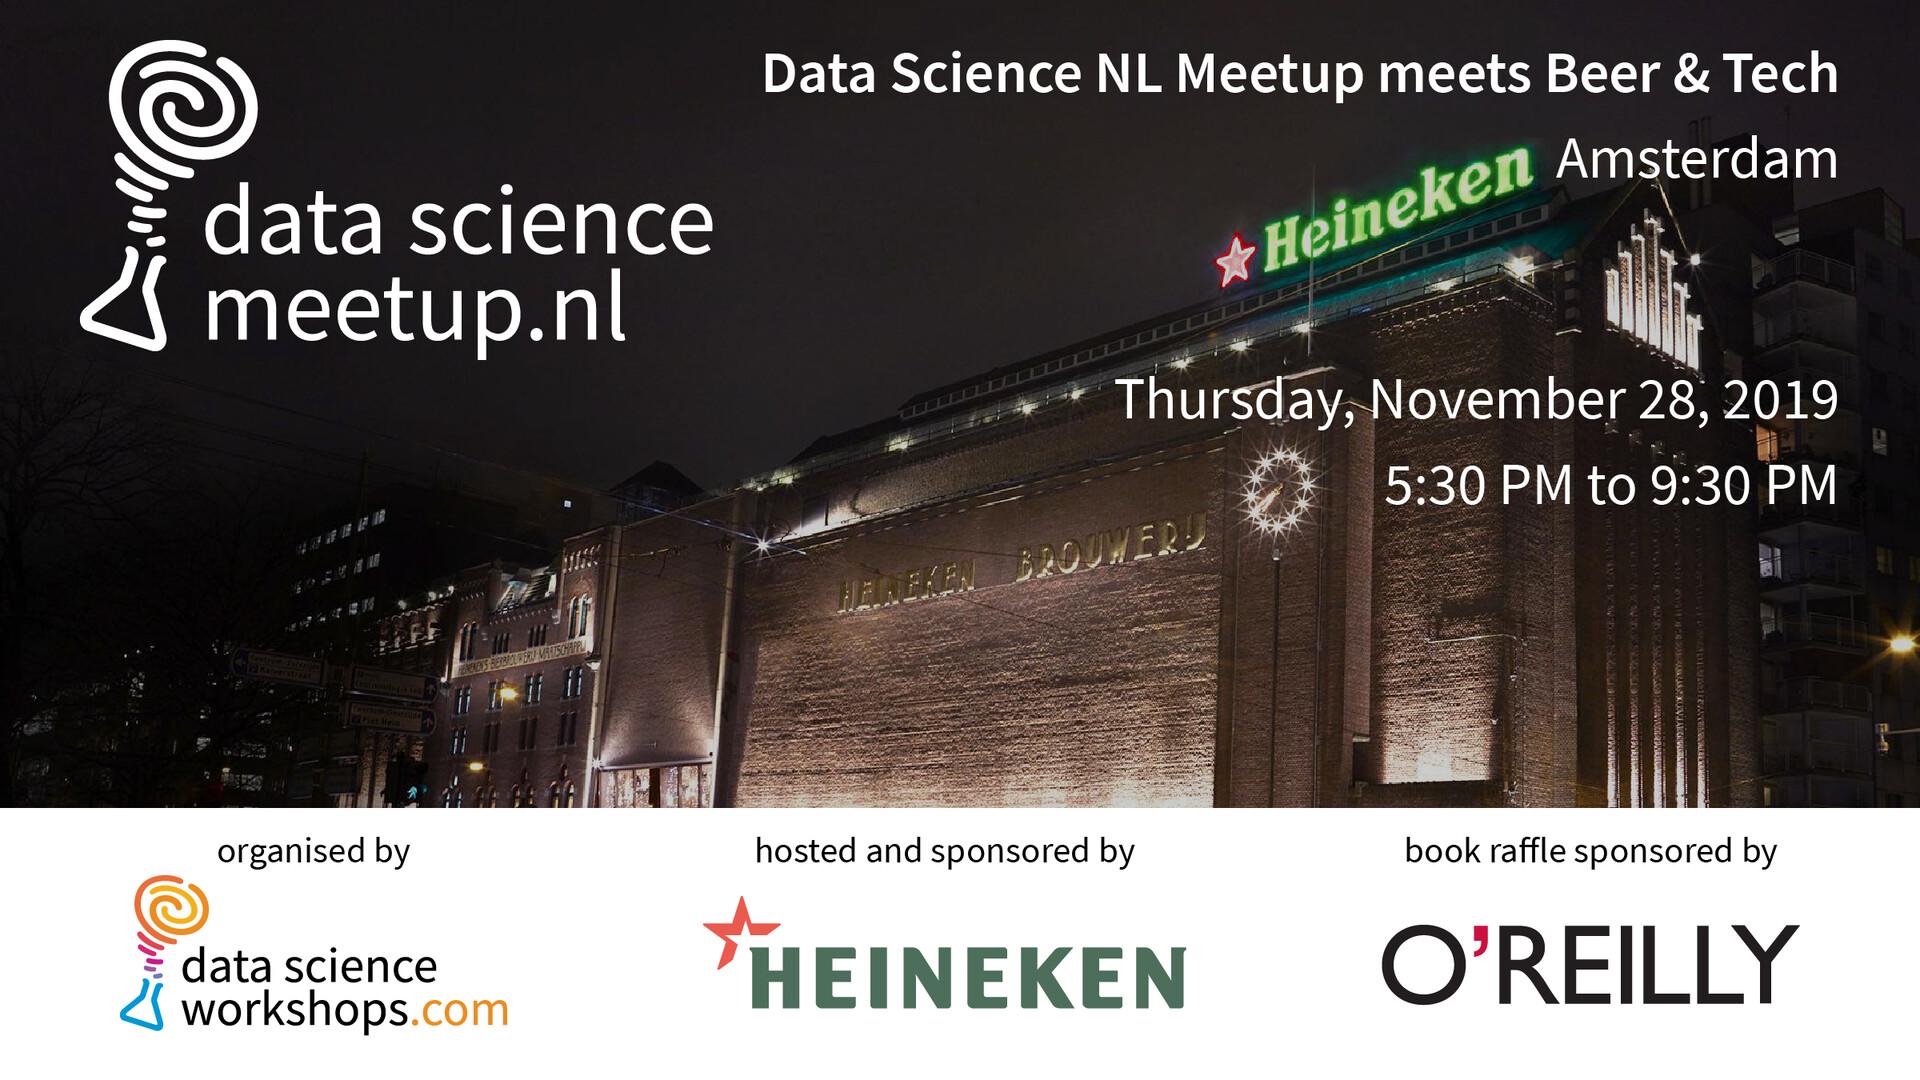 Data Science NL Meetup meets Beer & Tech